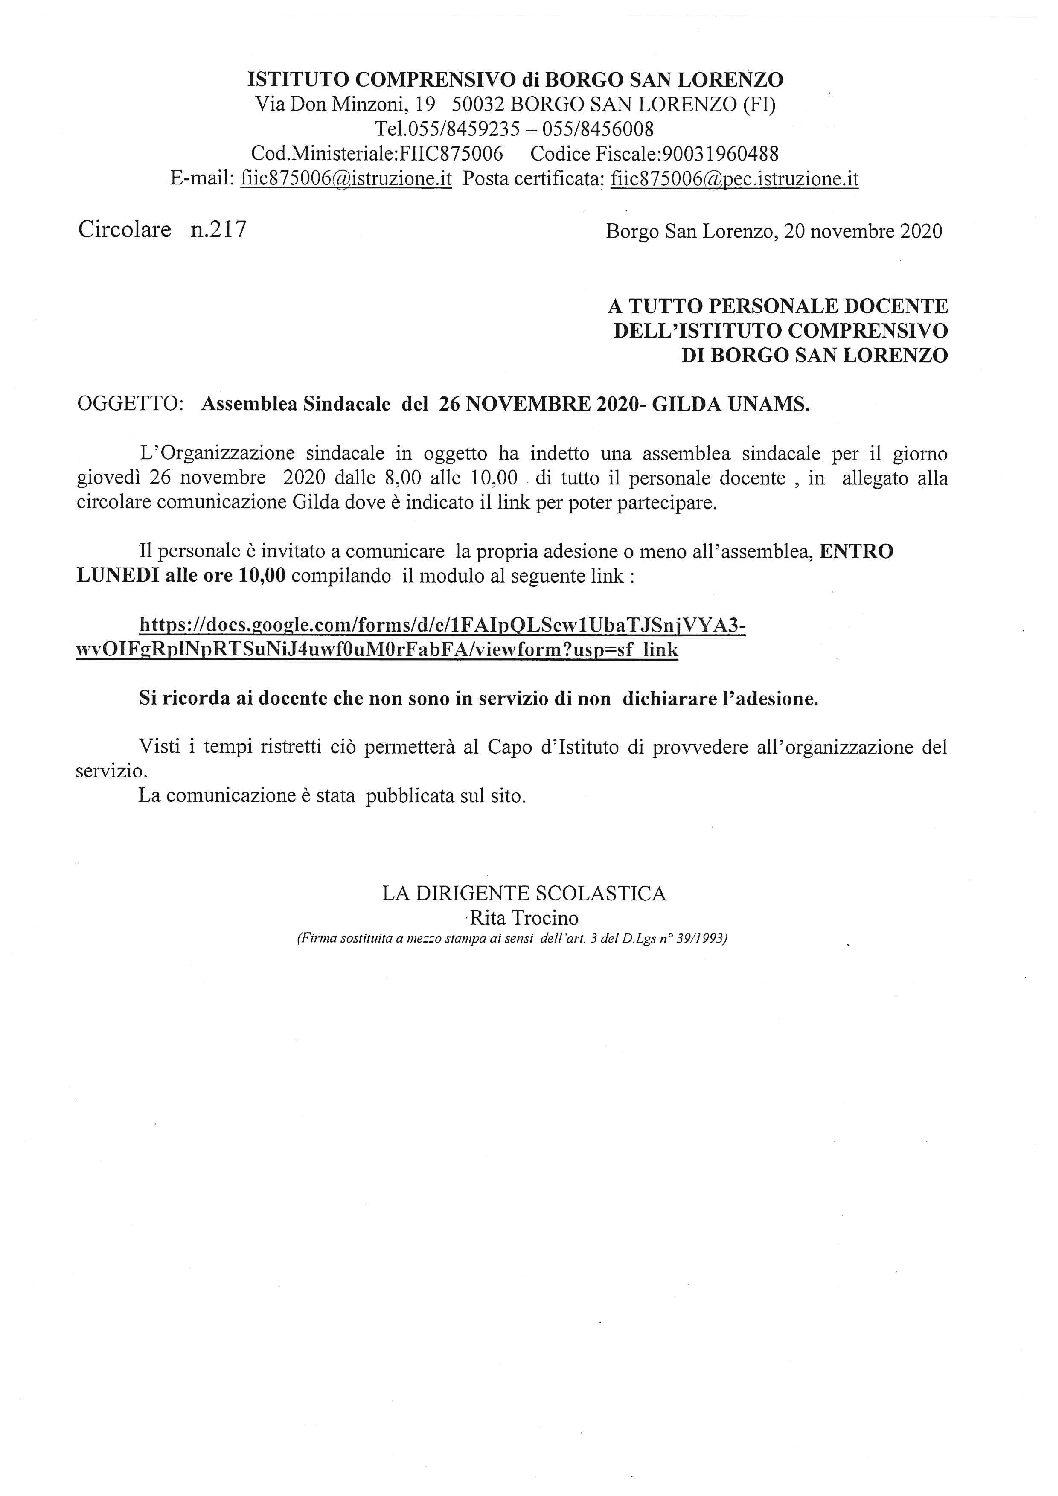 Assemblea sindacale 26/11/2020